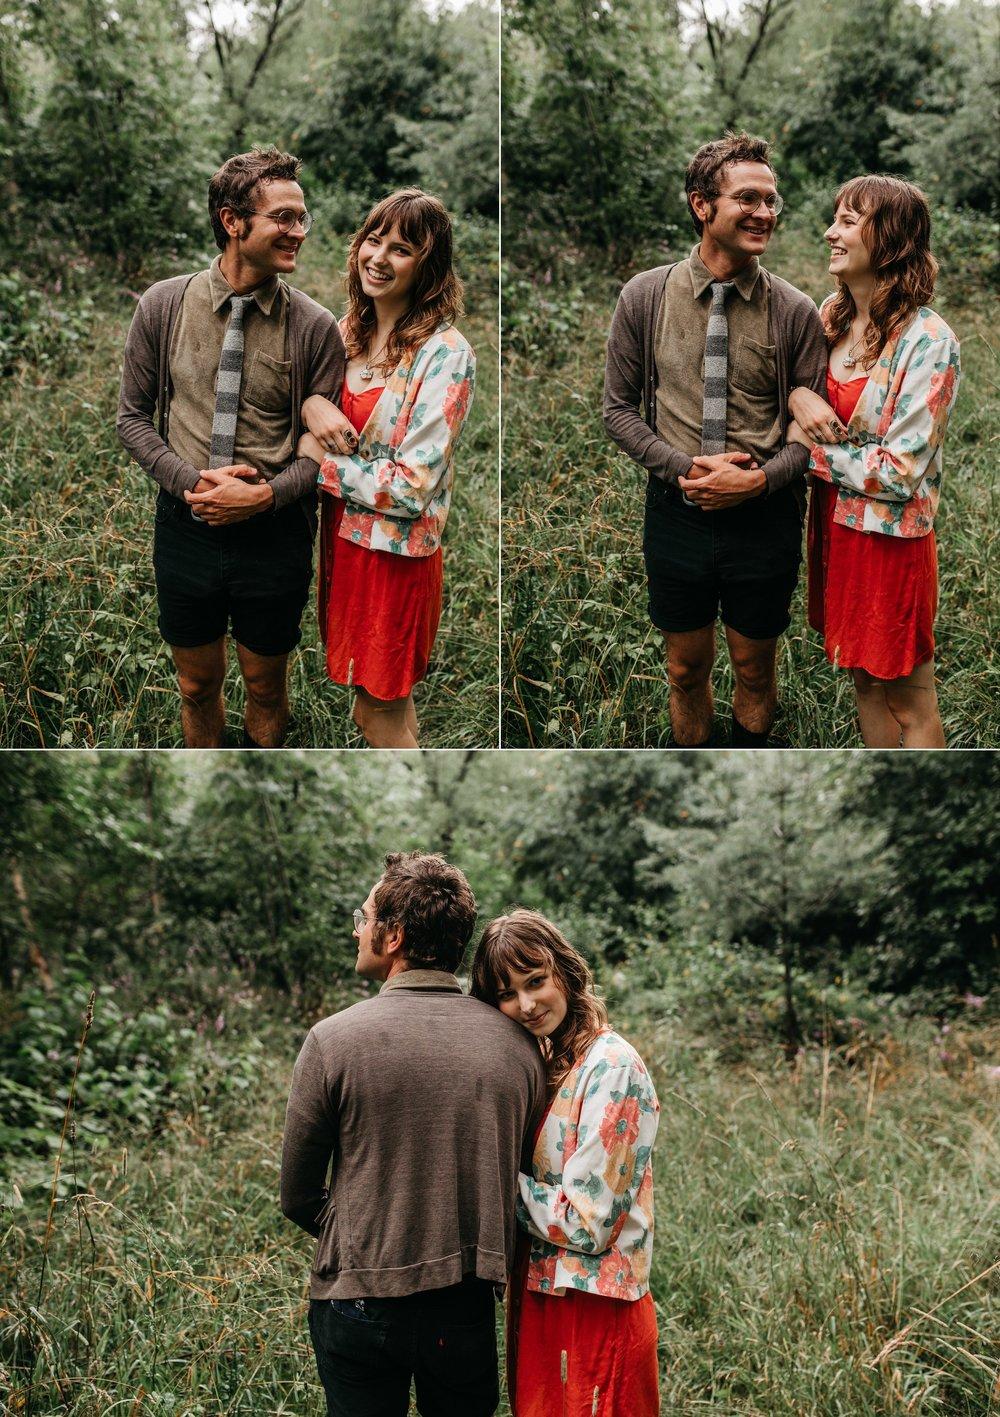 mandy aaron engagement minneapolis minnesota texas austin wedding elopement destination intimate best photographer_0113.jpg